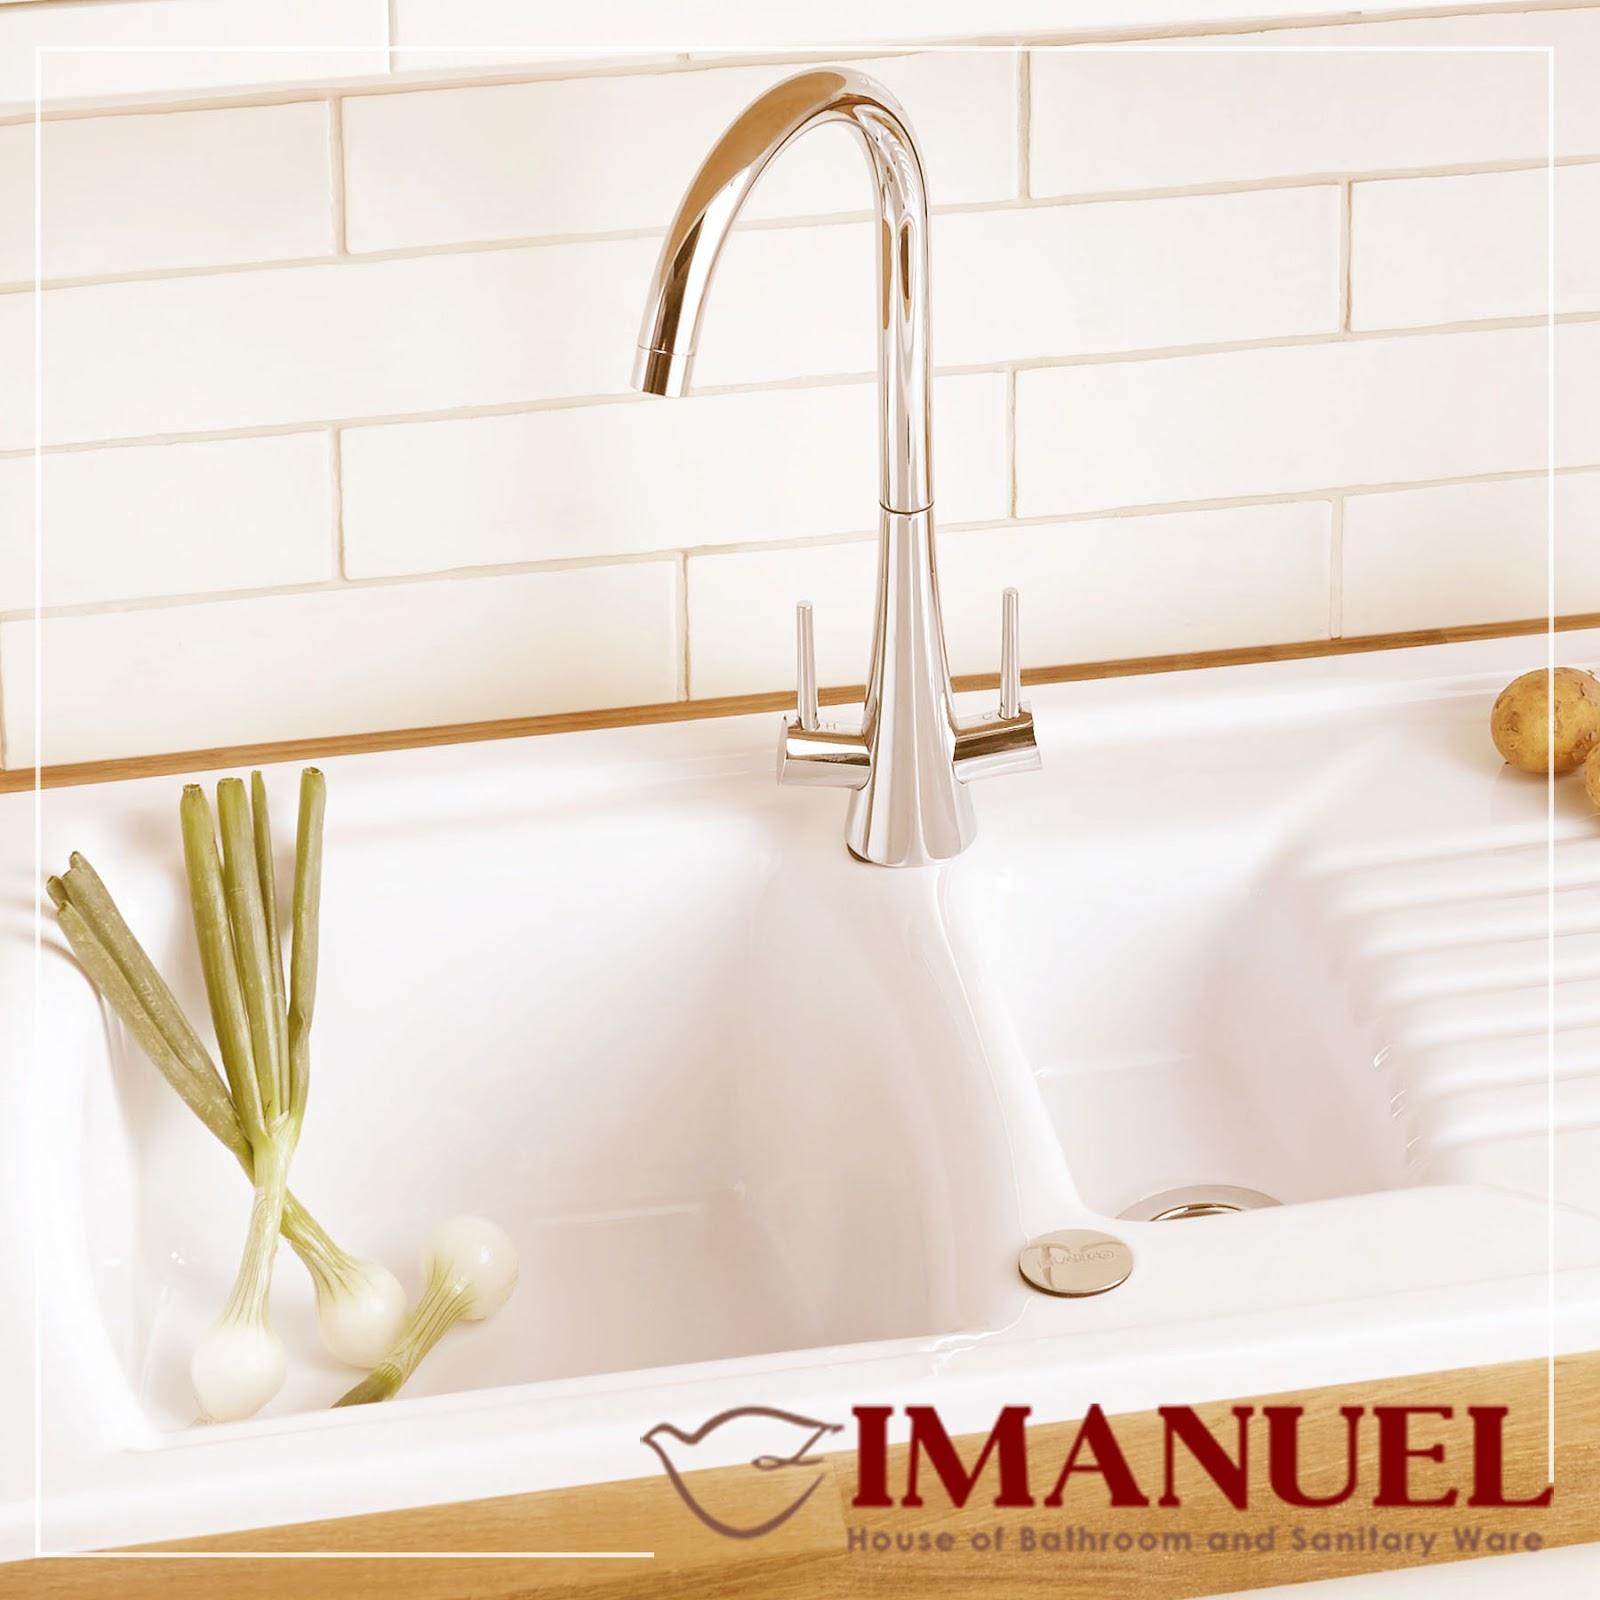 Koleksi Kitchen Sink Imanuel Baliwerti Imanuel Baliwerti House Of Bathroom Sanitary Ware